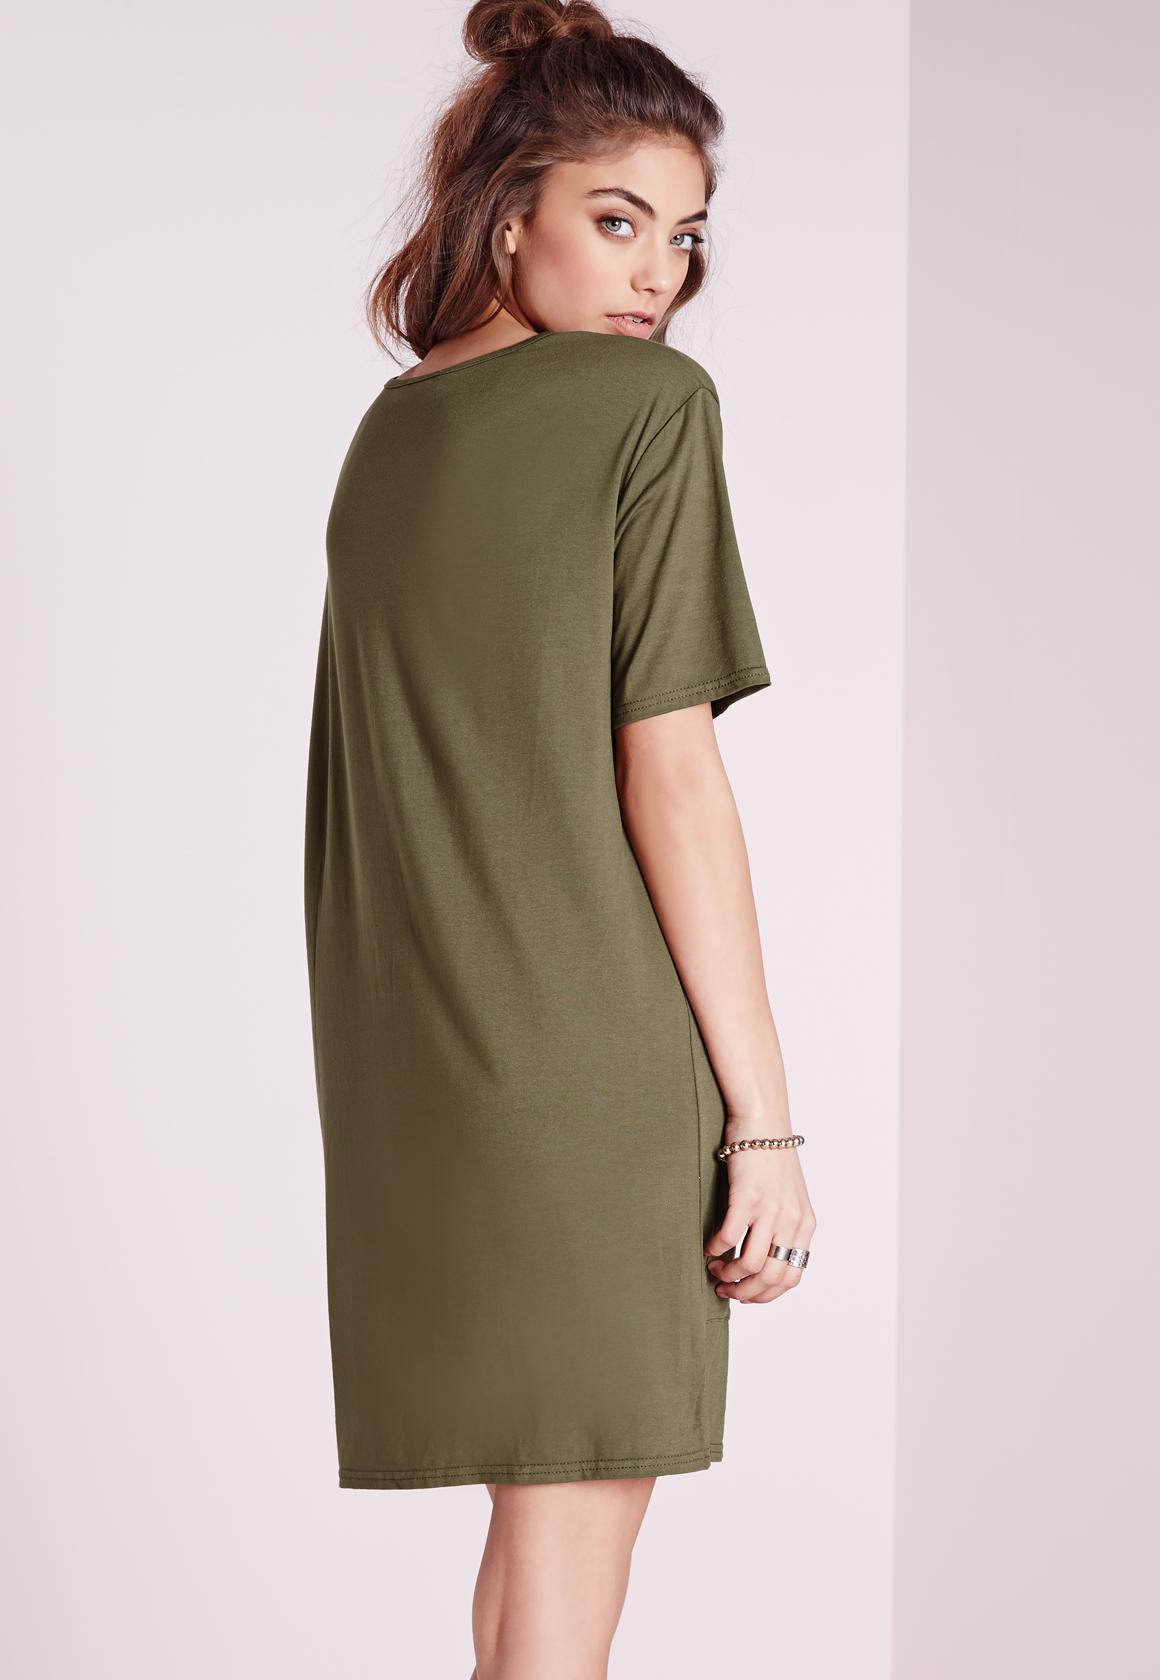 49b6d5f425f7 Lyst - Missguided Jersey Pocket Front T-shirt Dress Khaki in Natural